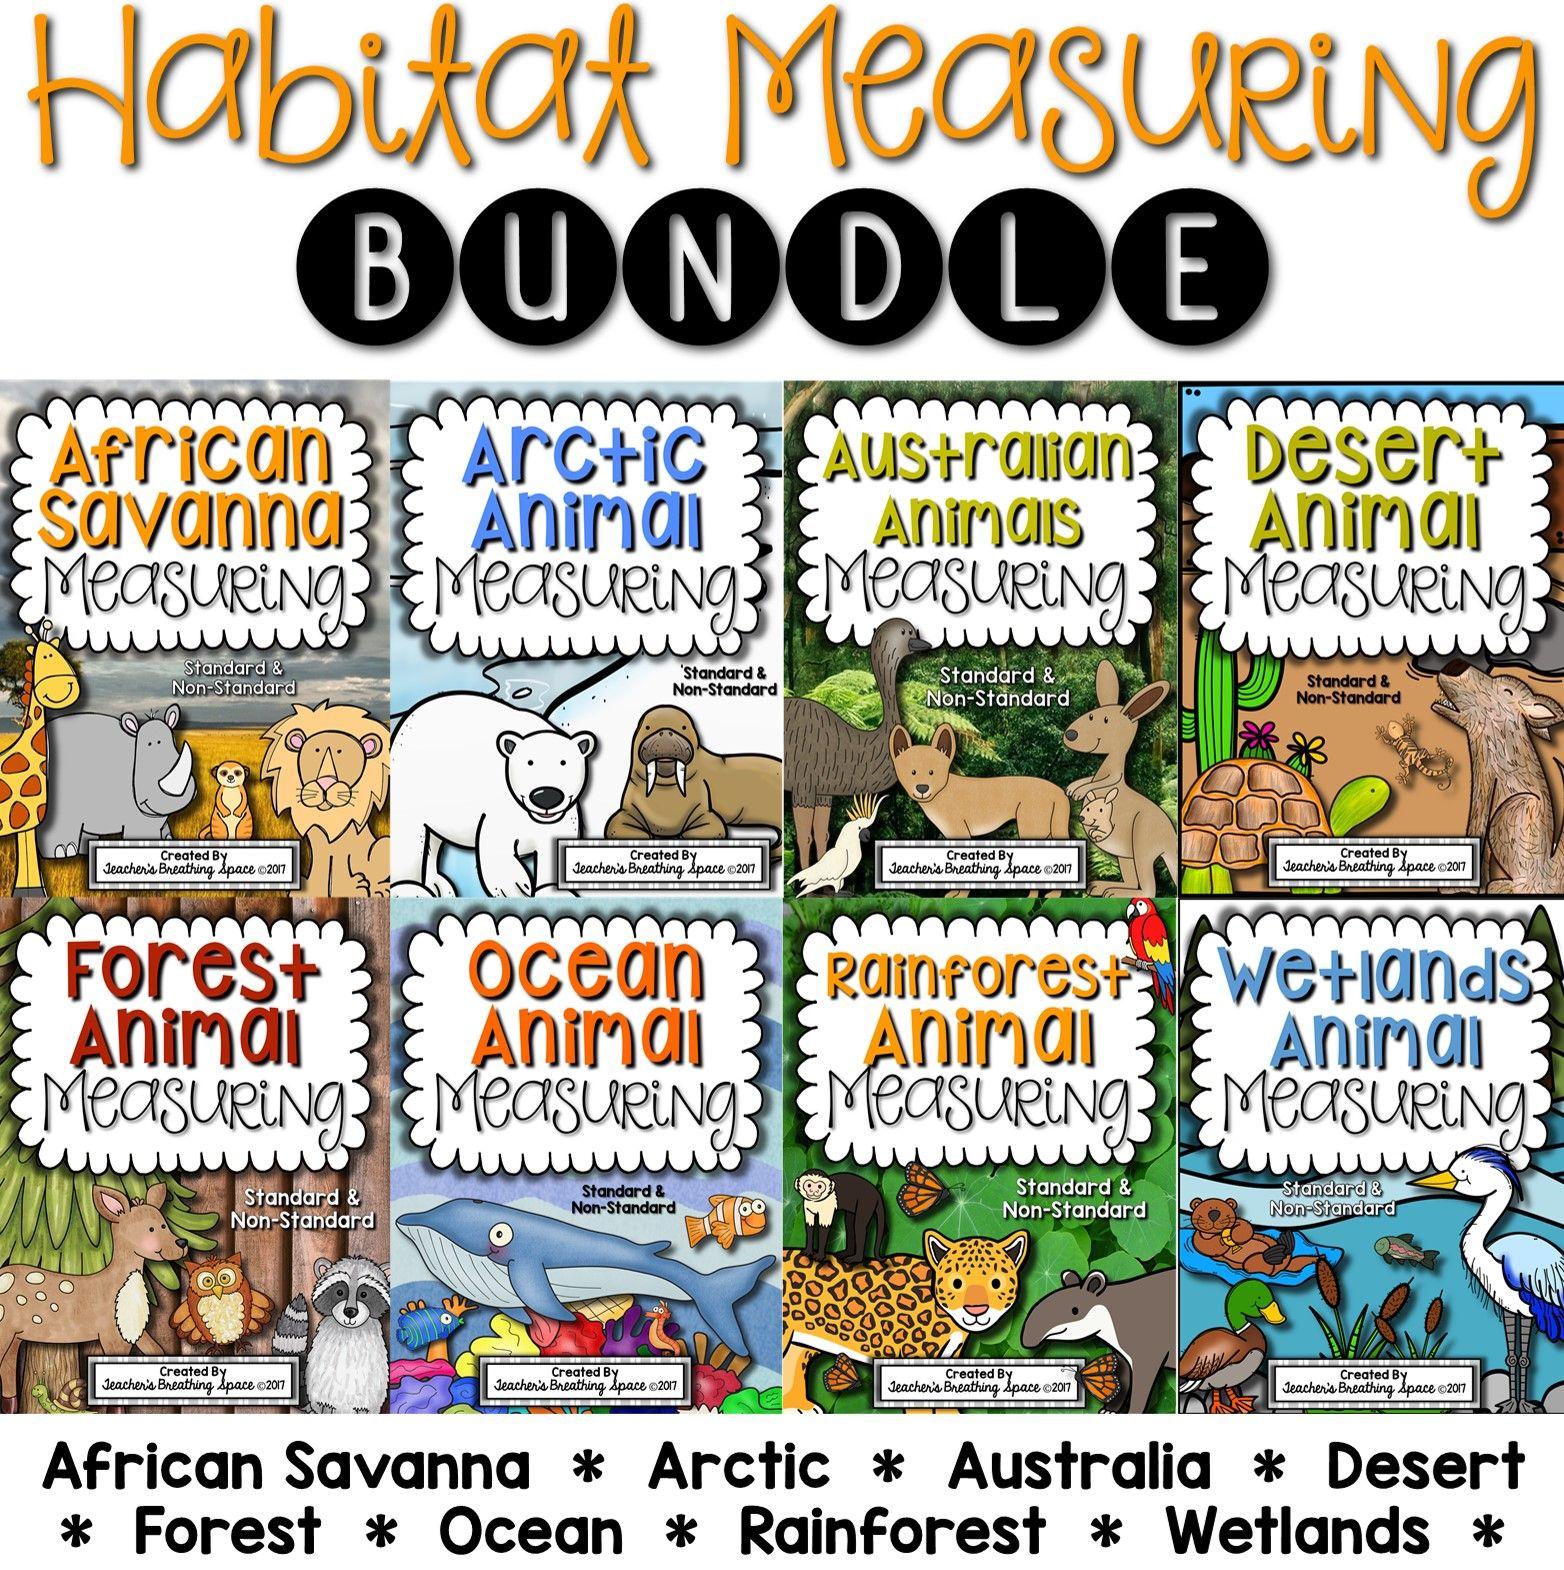 Habitat Measuring Bundle Includes Measuring Books And